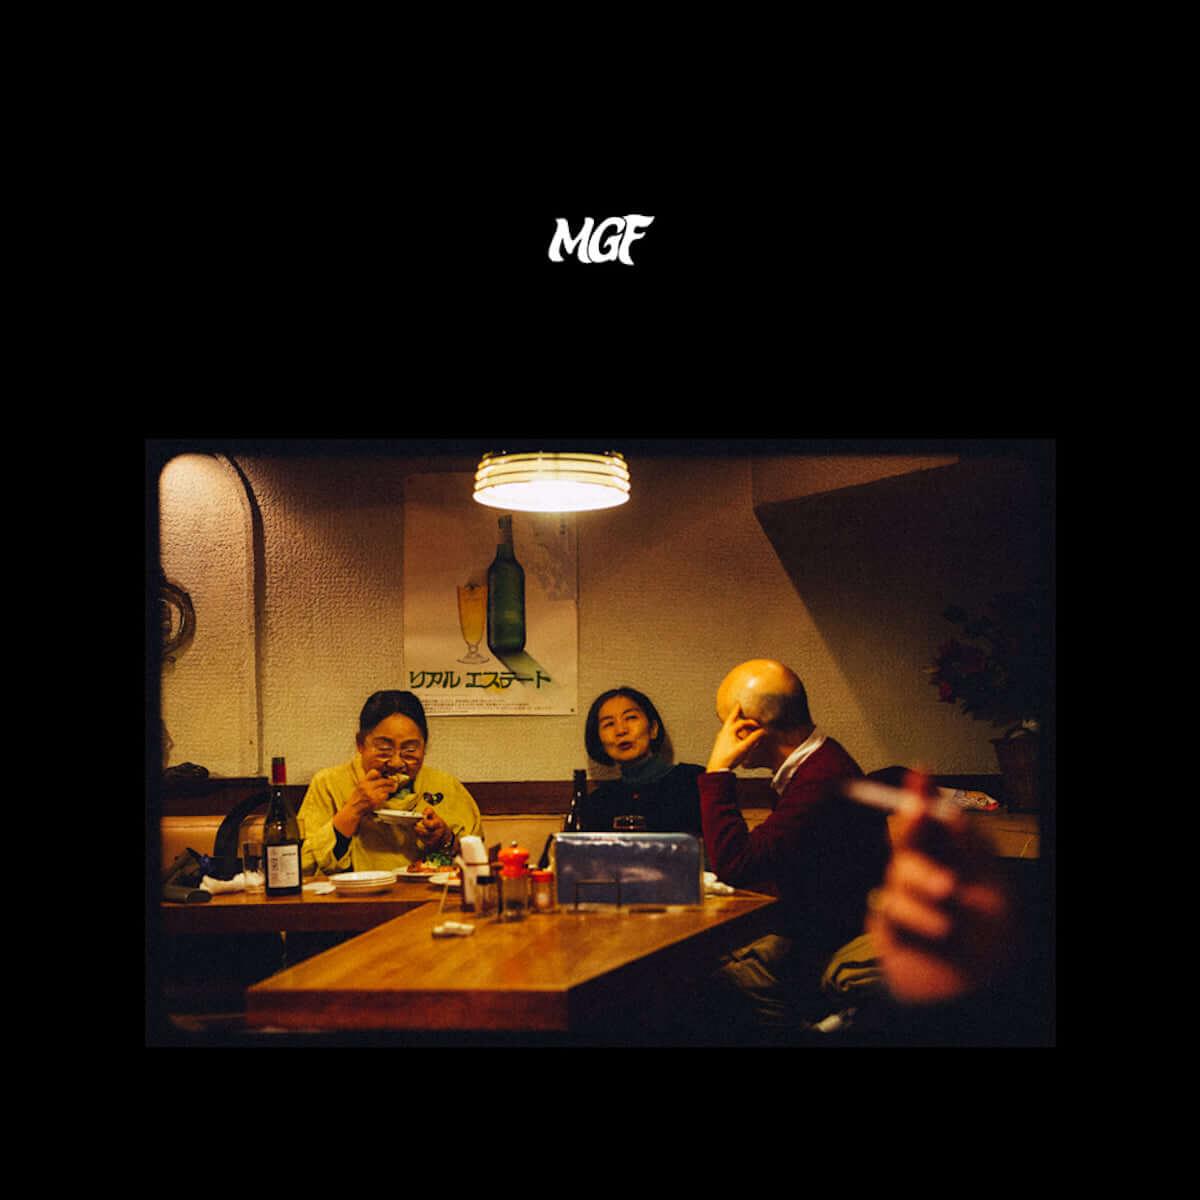 MGFが本日2ndアルバム『Real Estate』リリース|自主企画<Modern Groove Fashion>第2弾が5月11日にHARLEMにて開催 music190329_mgf_1-1200x1200